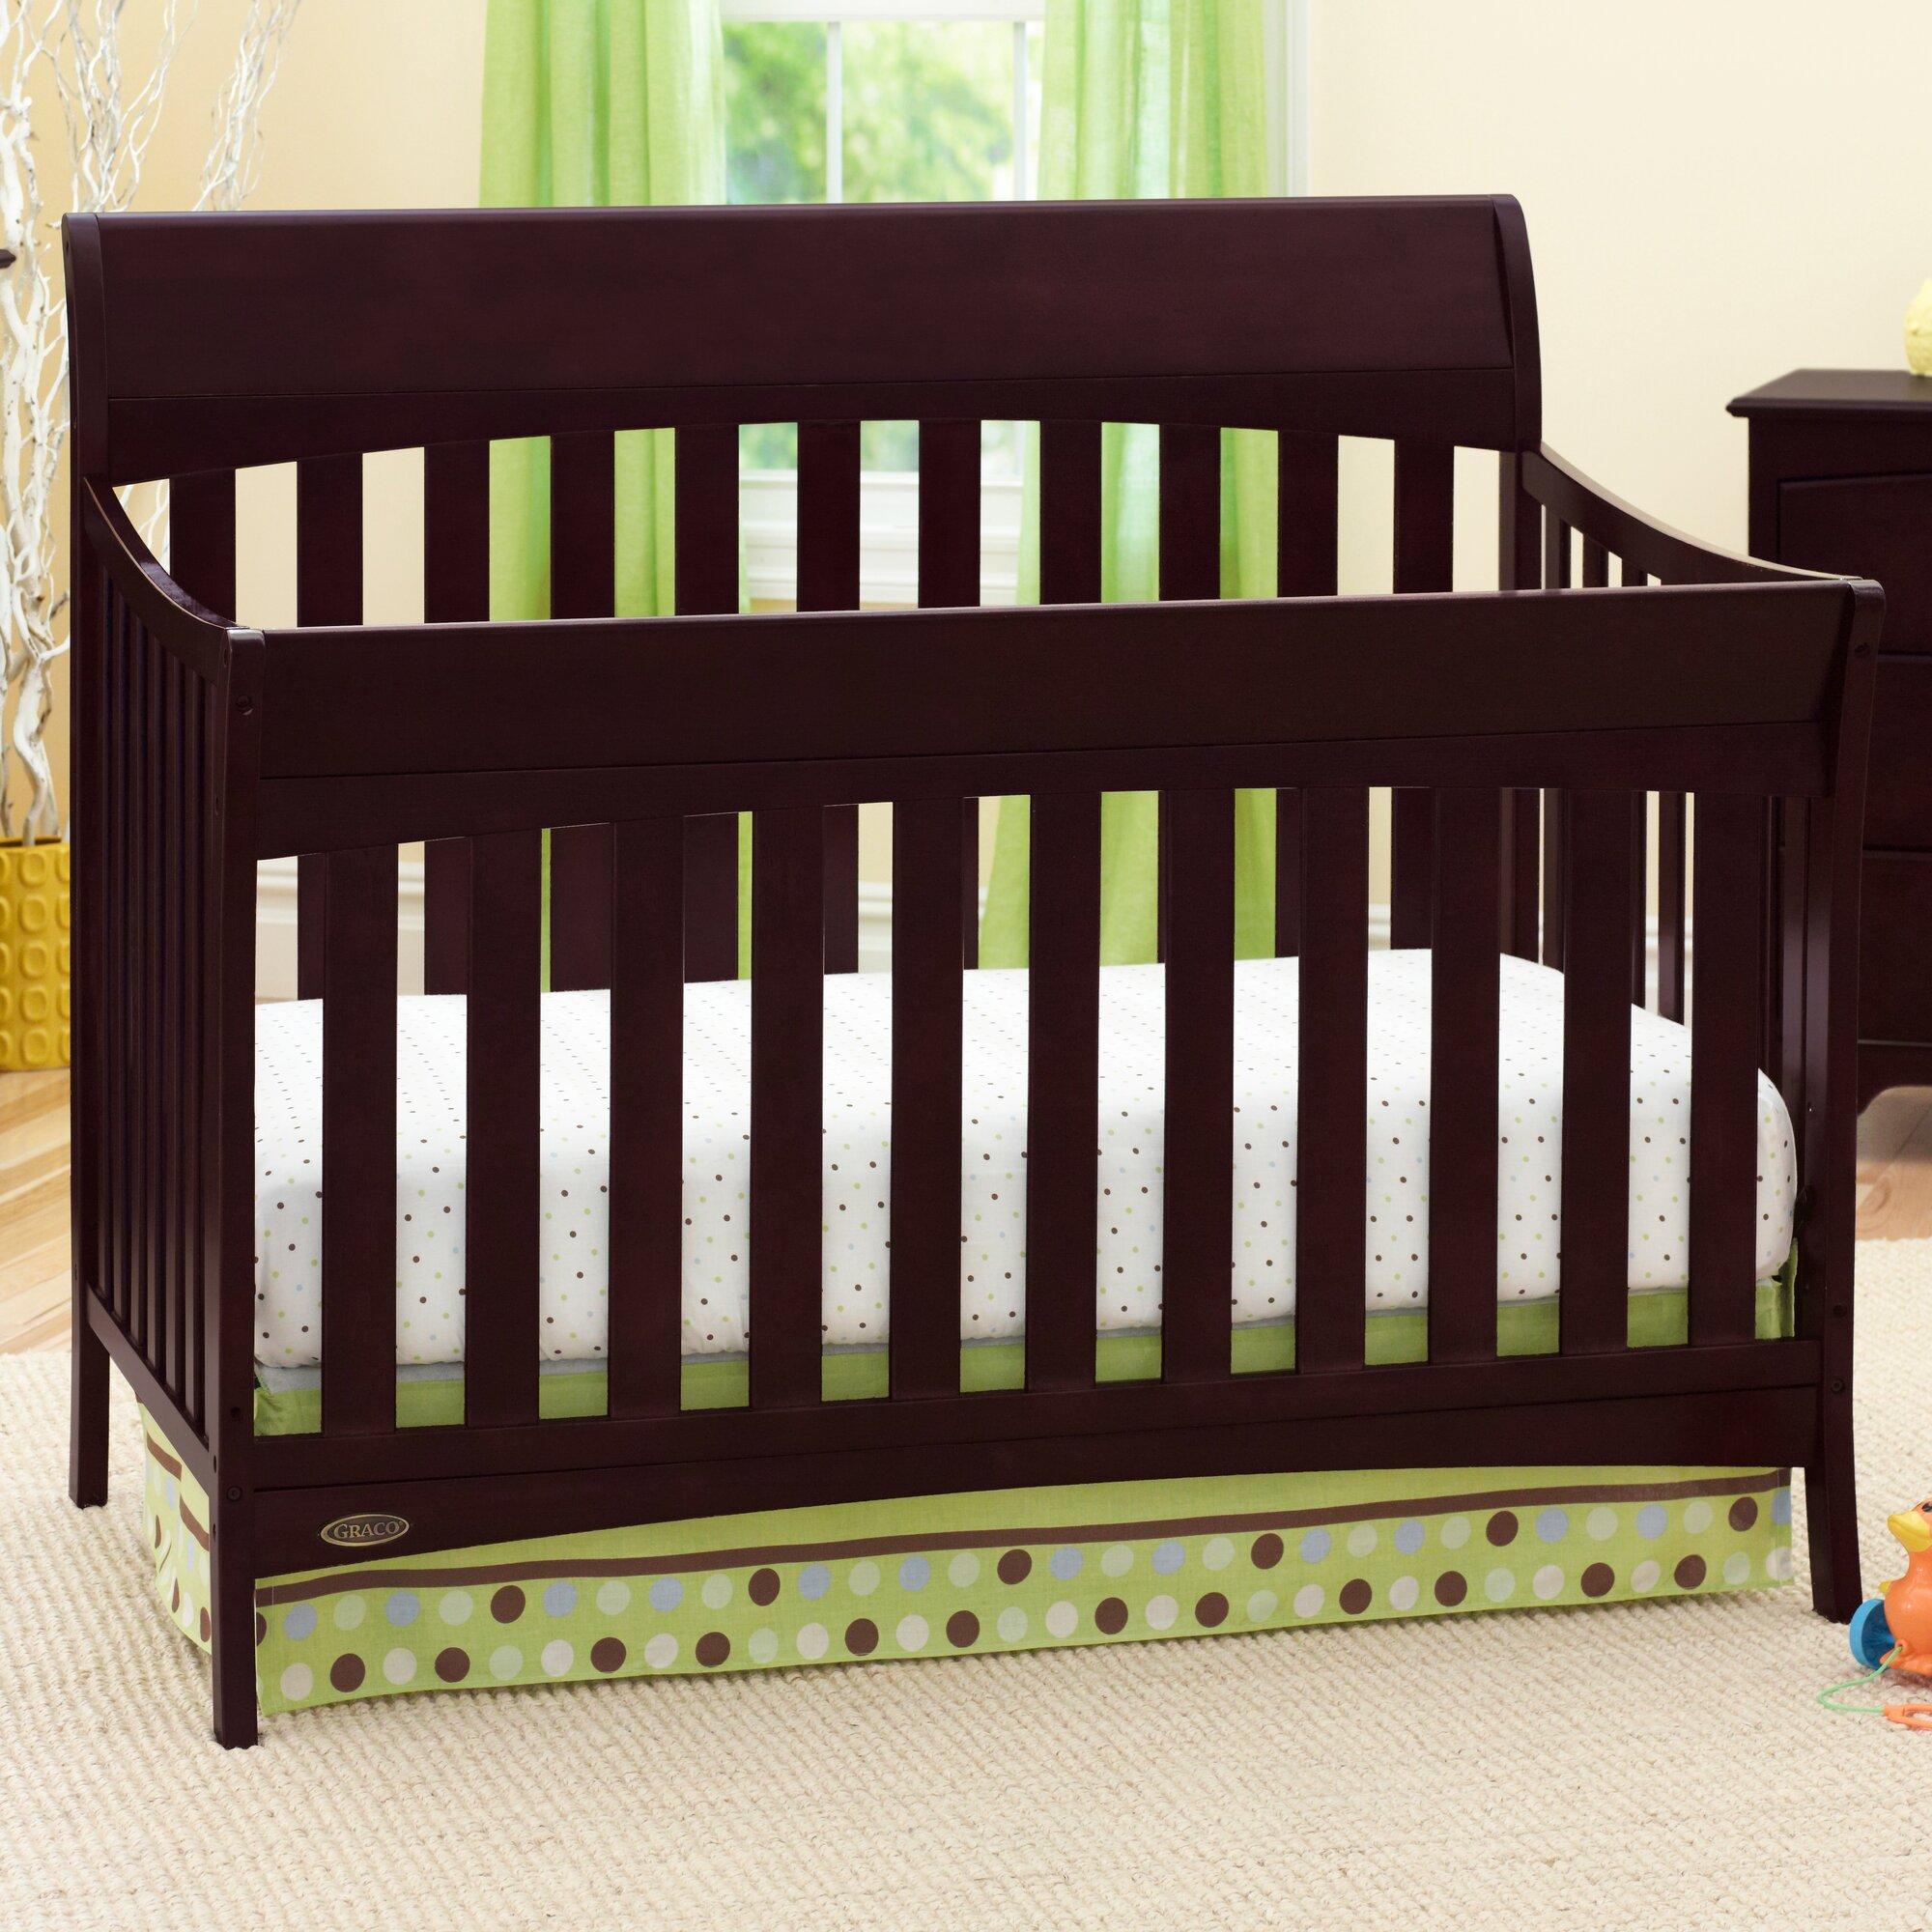 Child craft camden crib - Rory 4 In 1 Convertible Crib